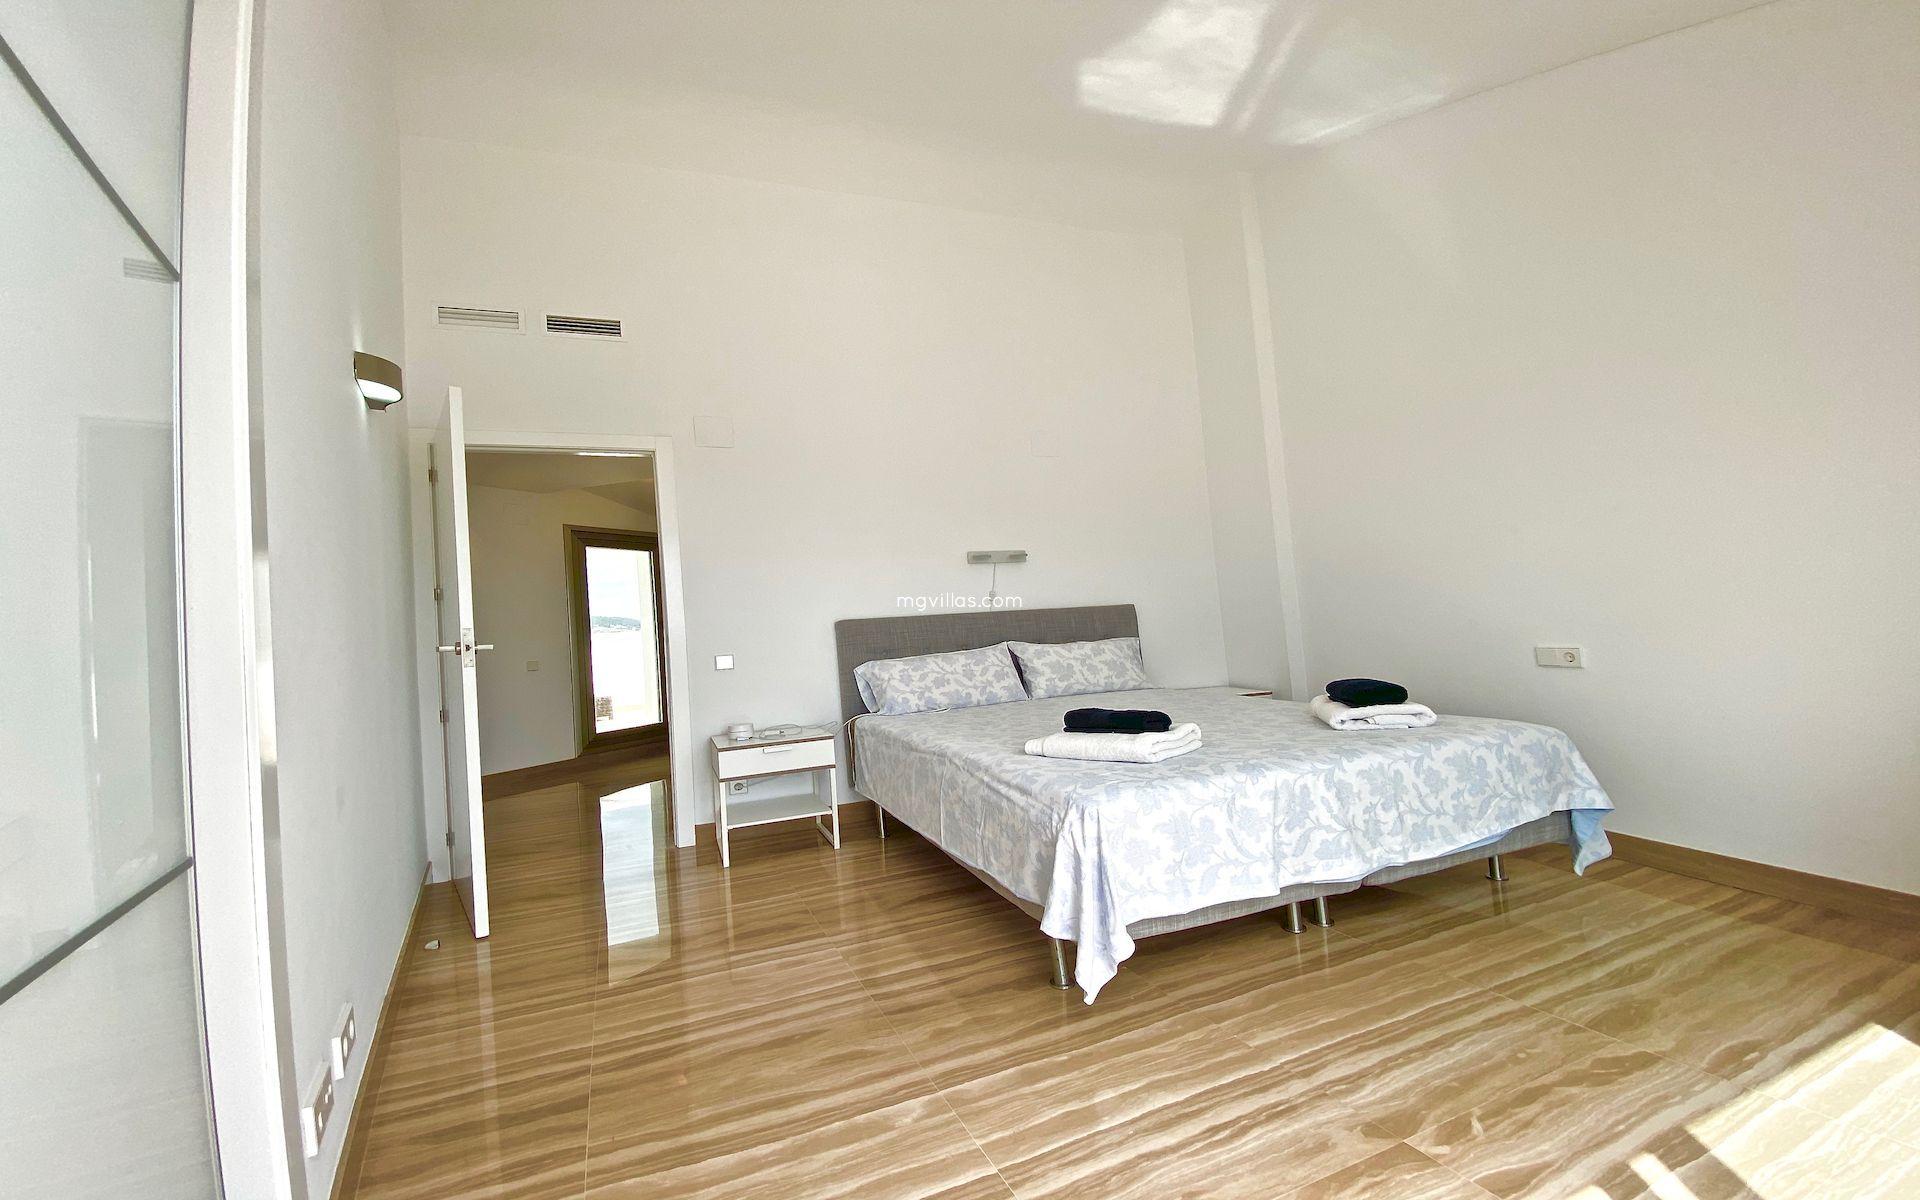 4 bedroom duplex penthouse with sea view - Javea - Costa Blanca